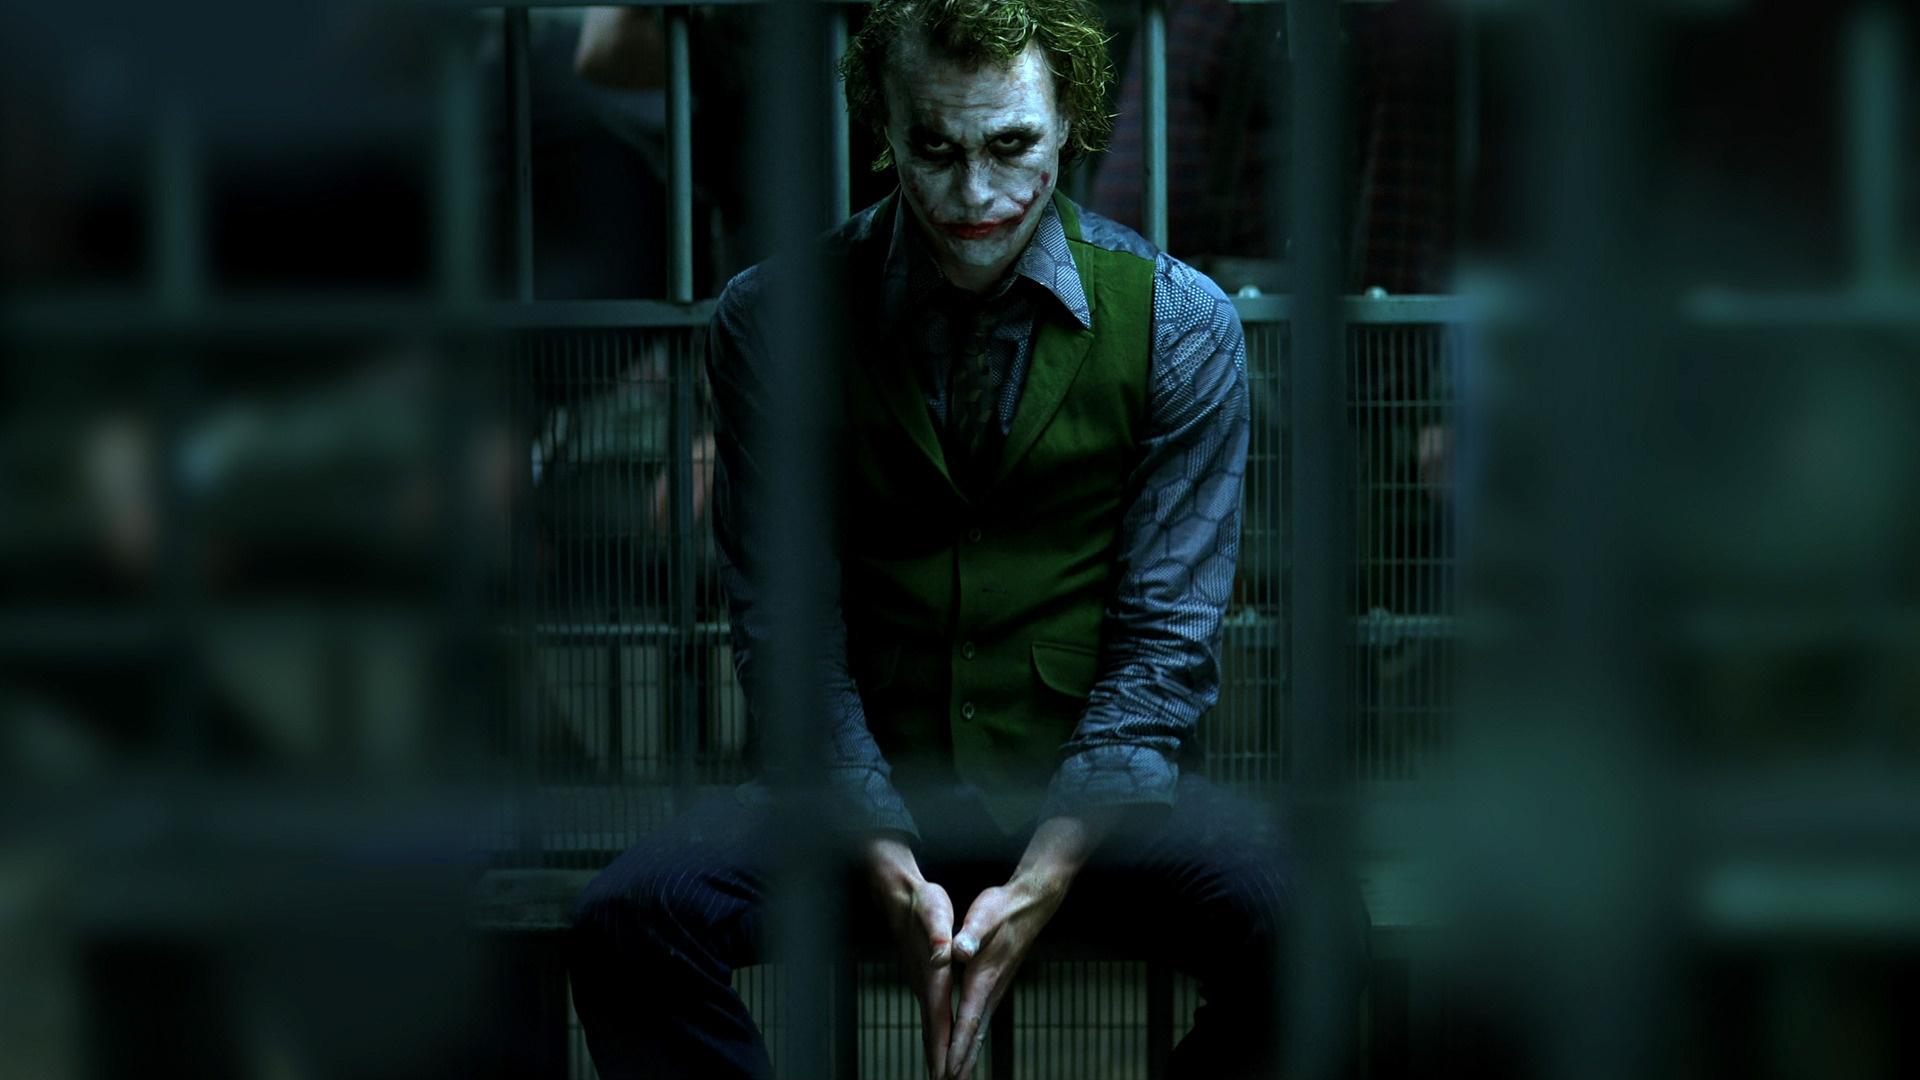 8589130461941 batman the dark knight joker wallpaper hd Hacerse la 1920x1080